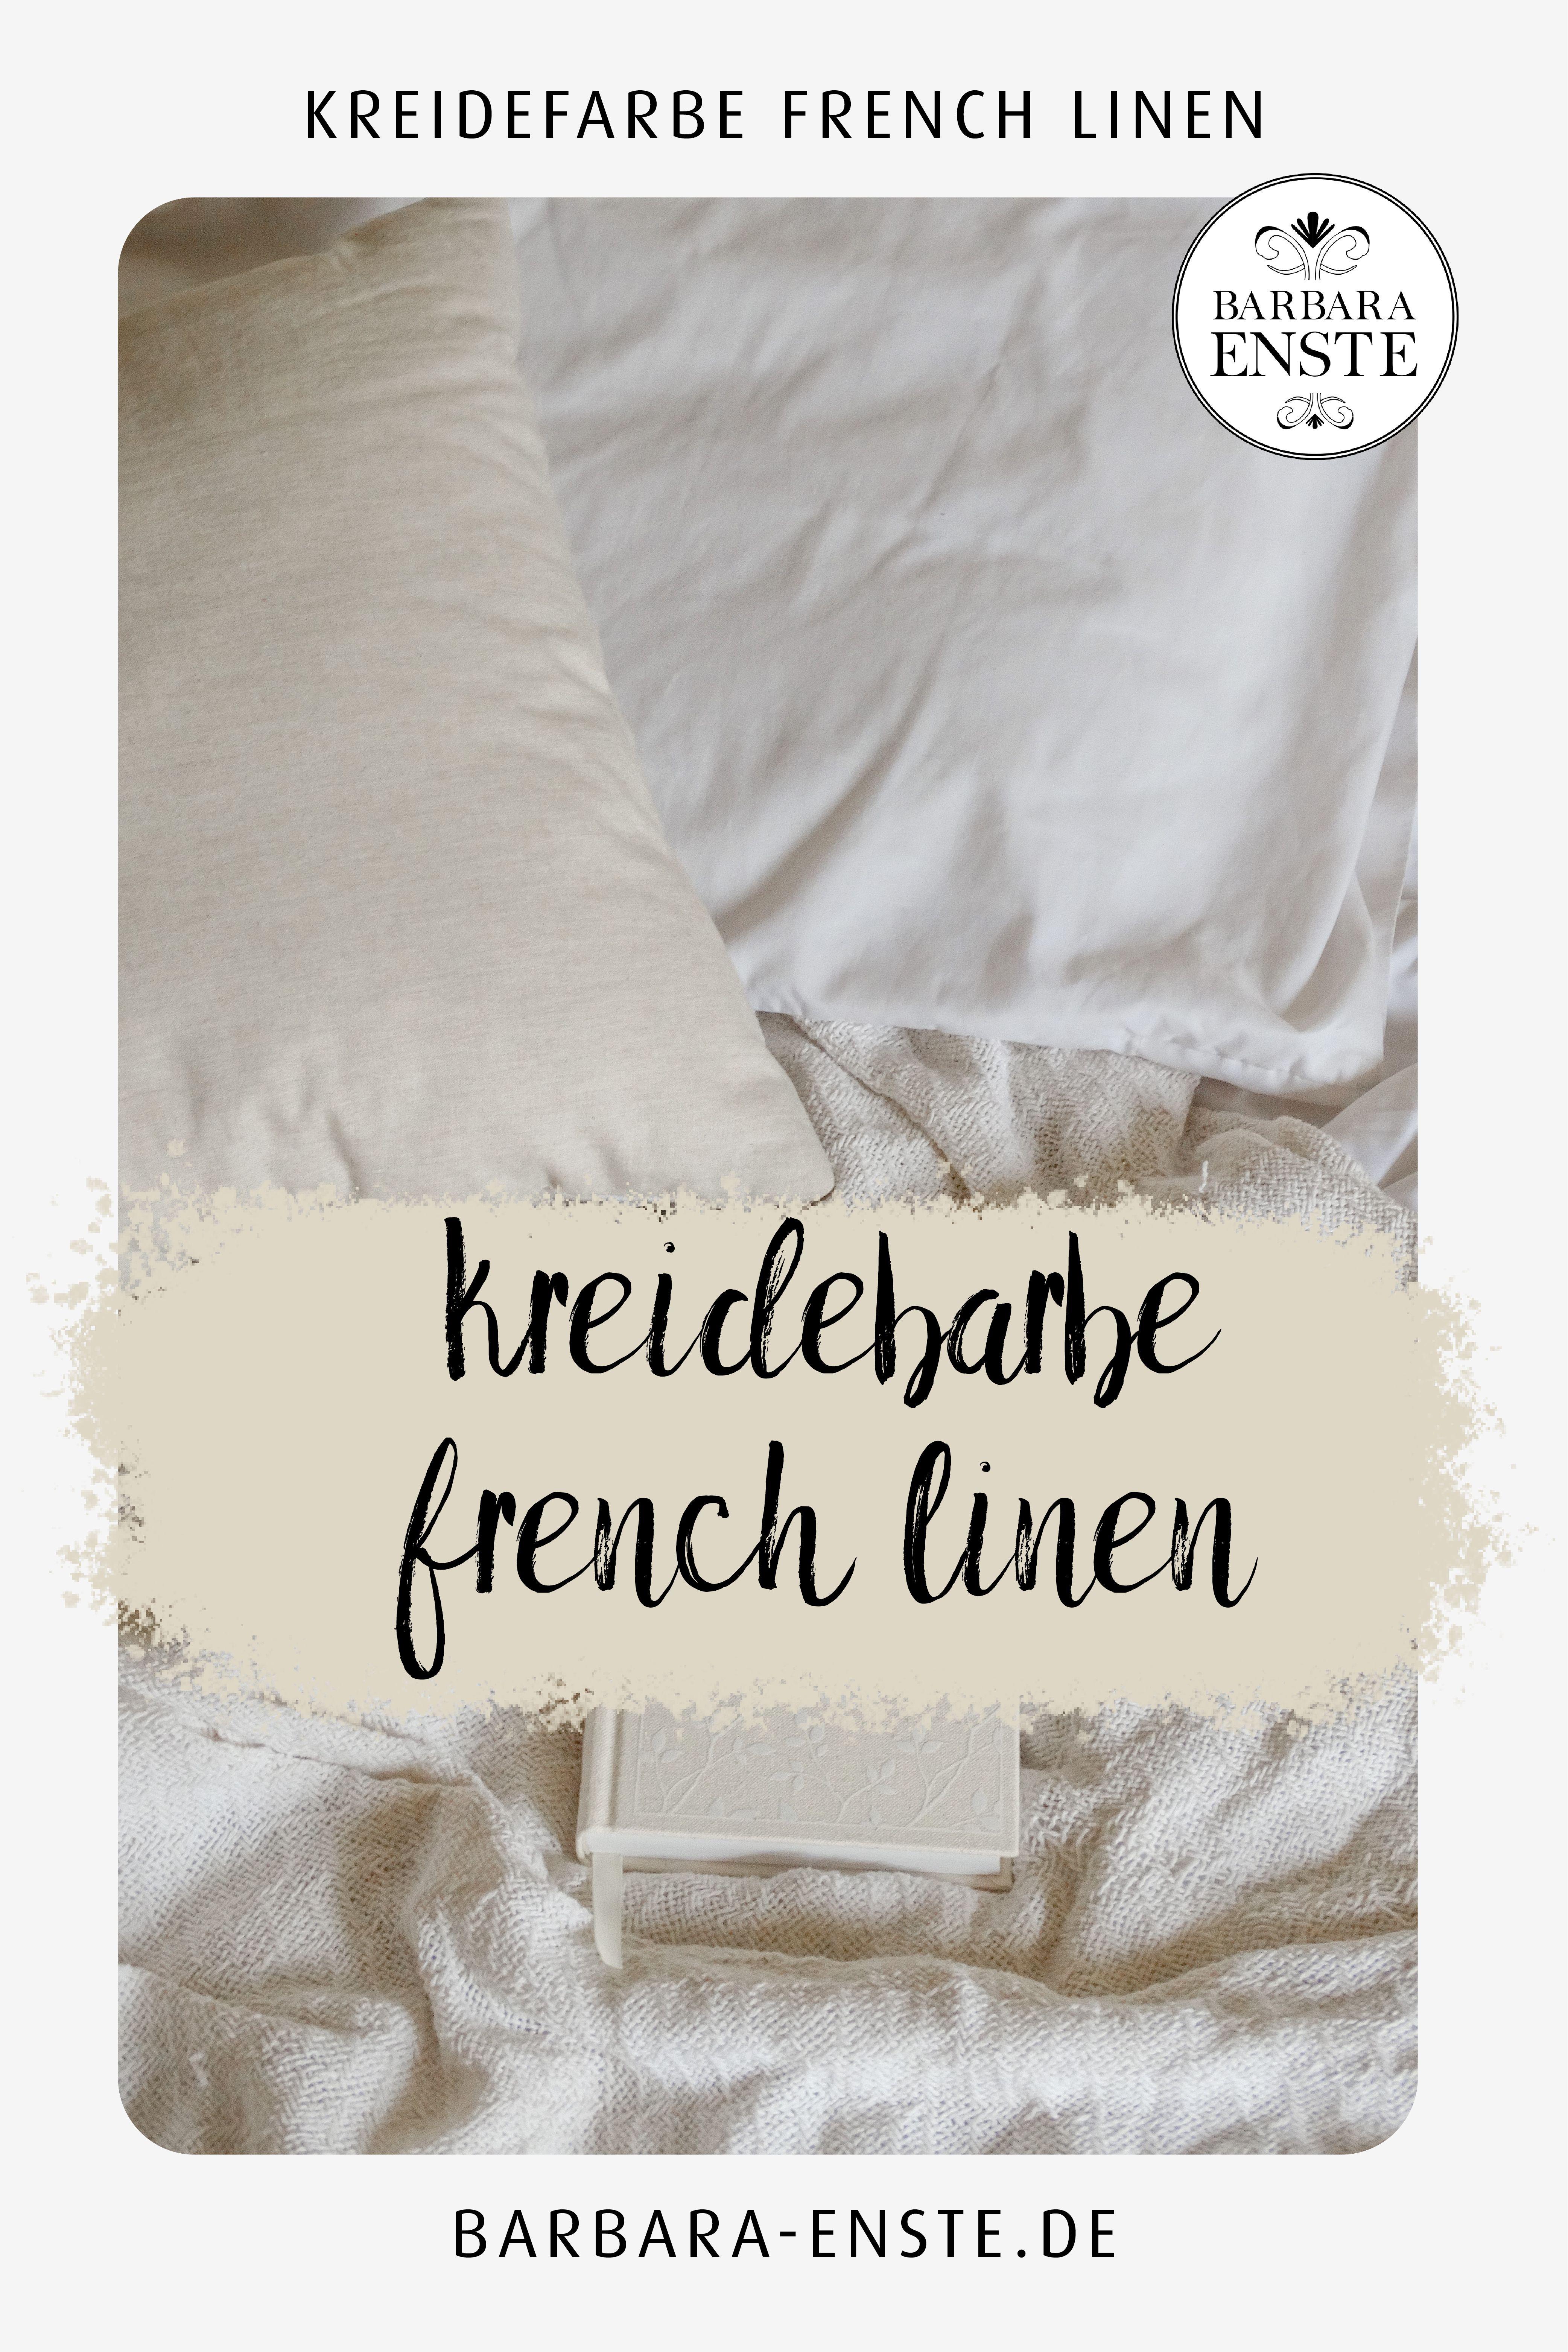 Kreidefarben Von Painting The Past Mobelfarbe Farbton French Linen In 2020 Kreidefarbe Kreide